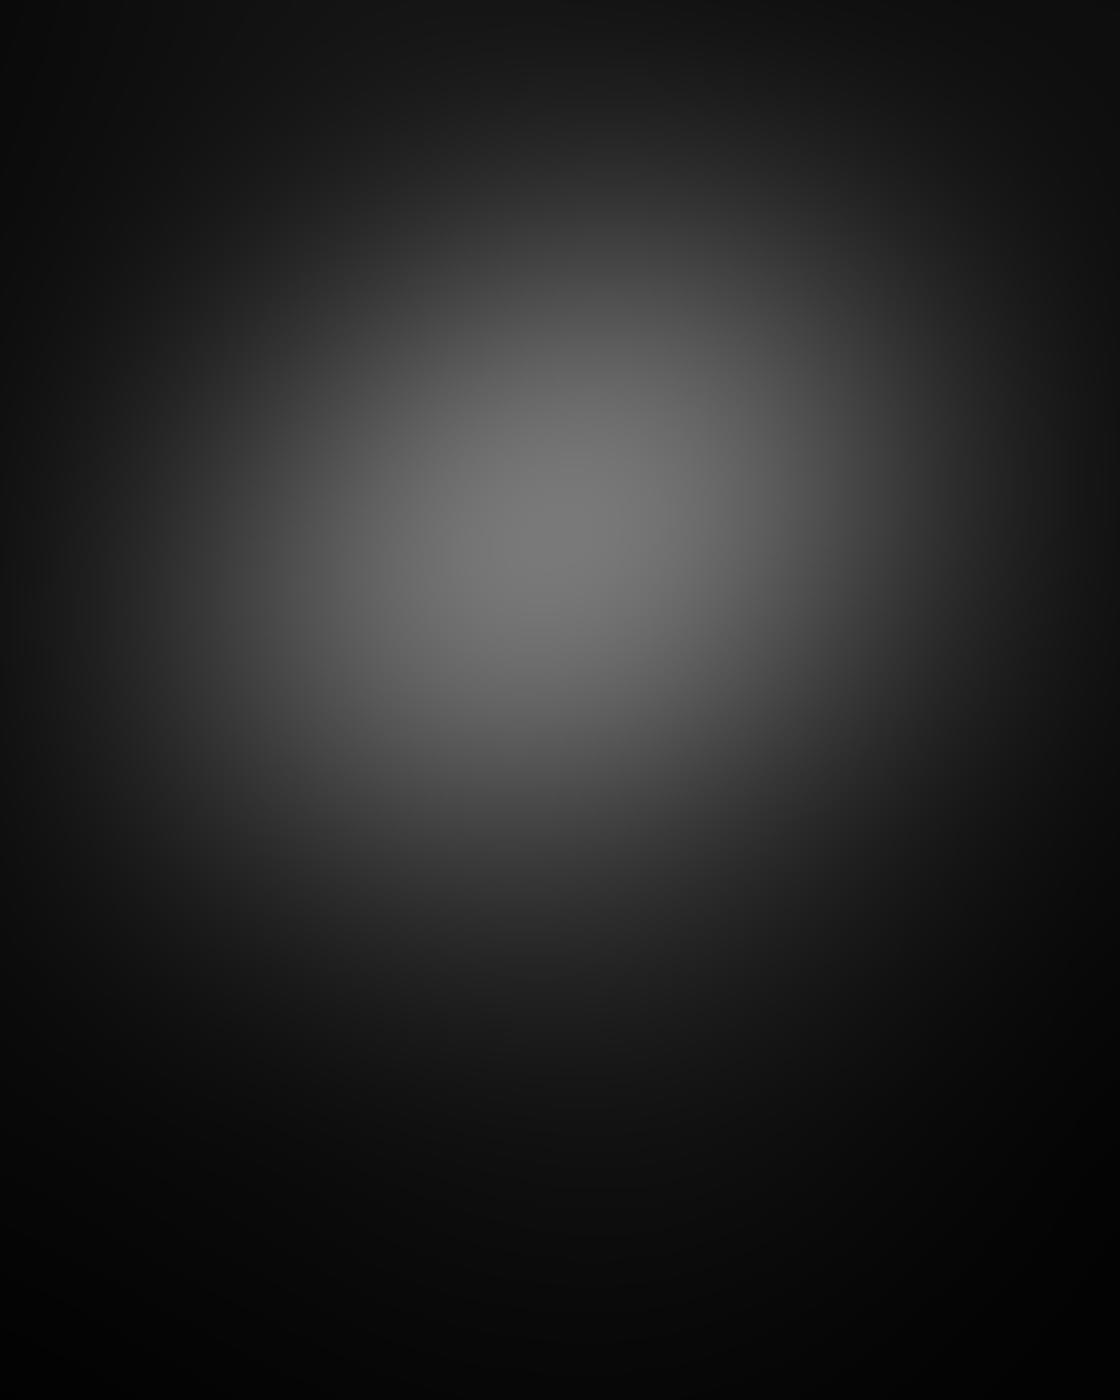 iPhone Photo Black White 13